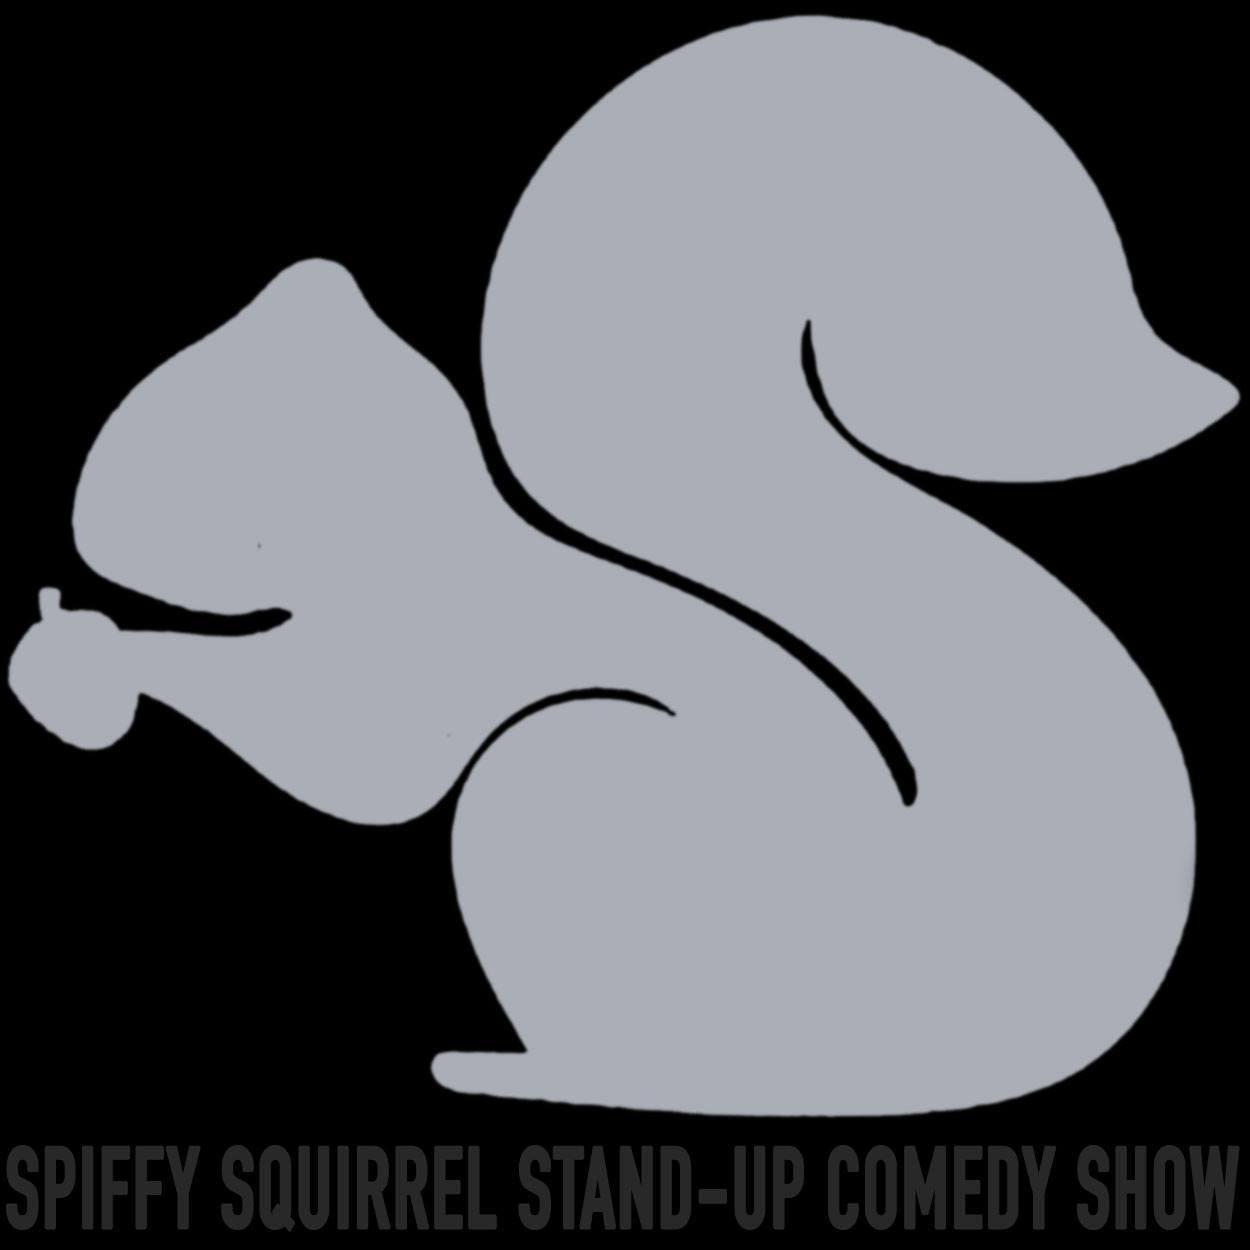 spiffy squirrel logo.jpg